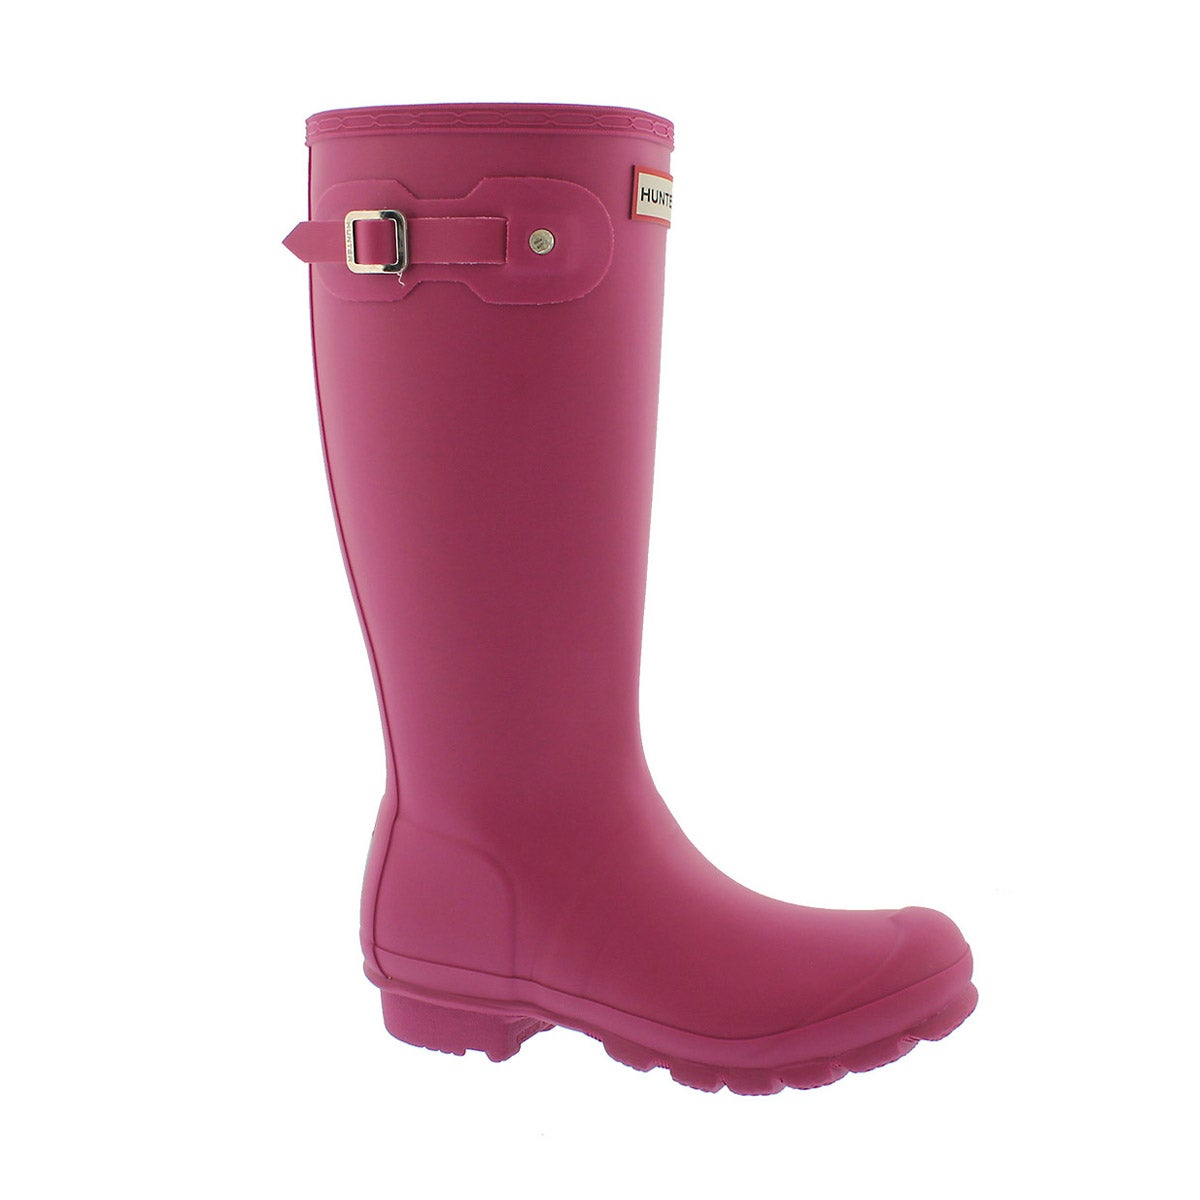 Girls' ORIGINAL YOUNG iron pink rain boots